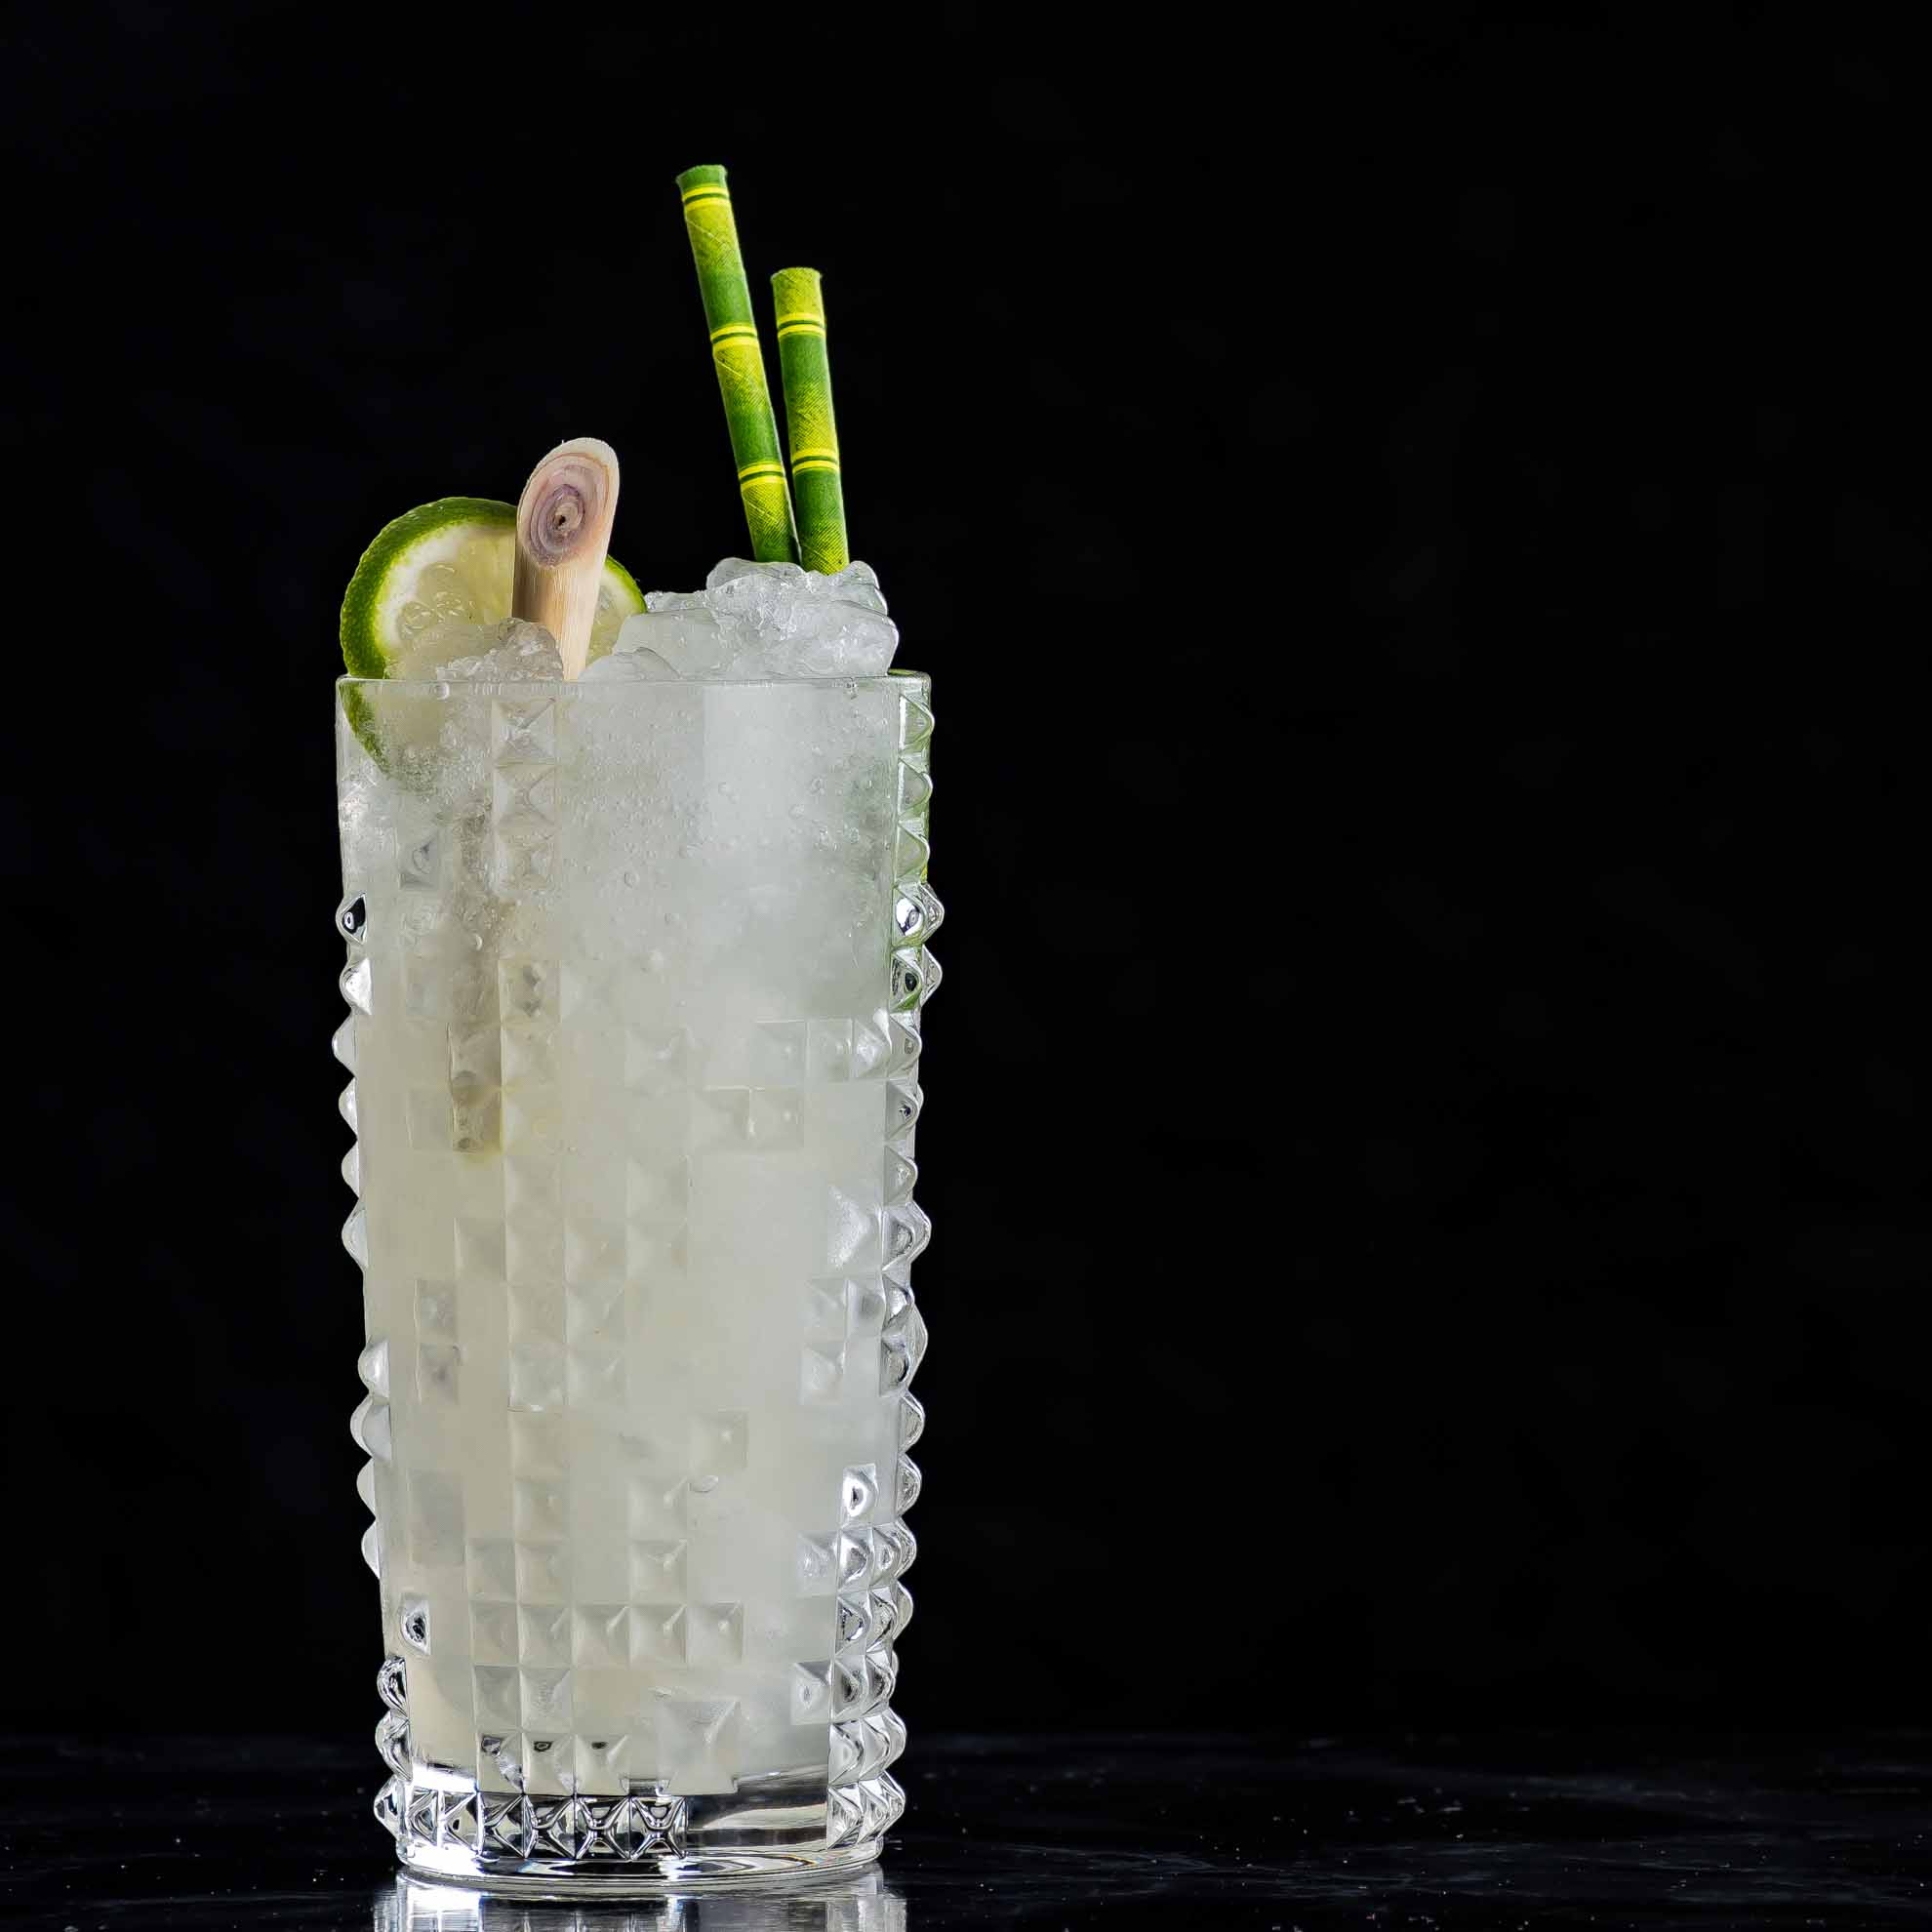 Ein Yauatcha Highball mit Oolong-Zitronengras-Rum.